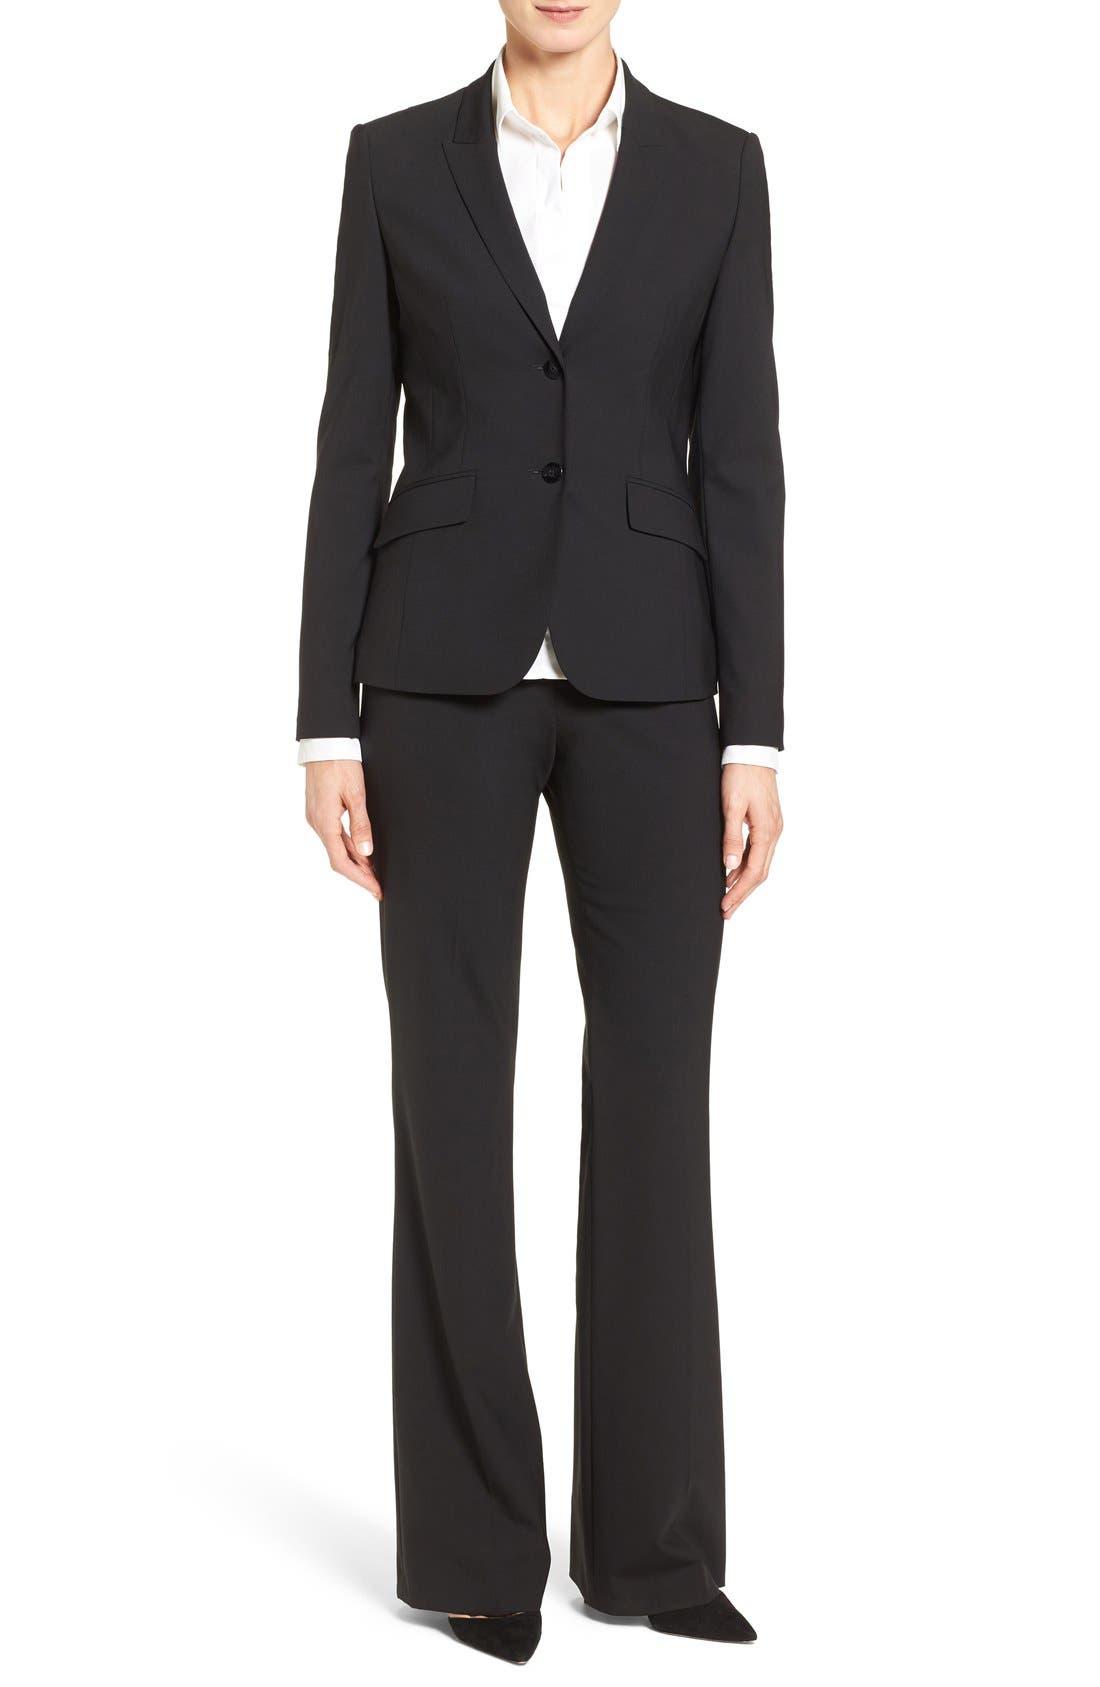 BOSS Suit Jacket, Bootcut Trousers & Shirt